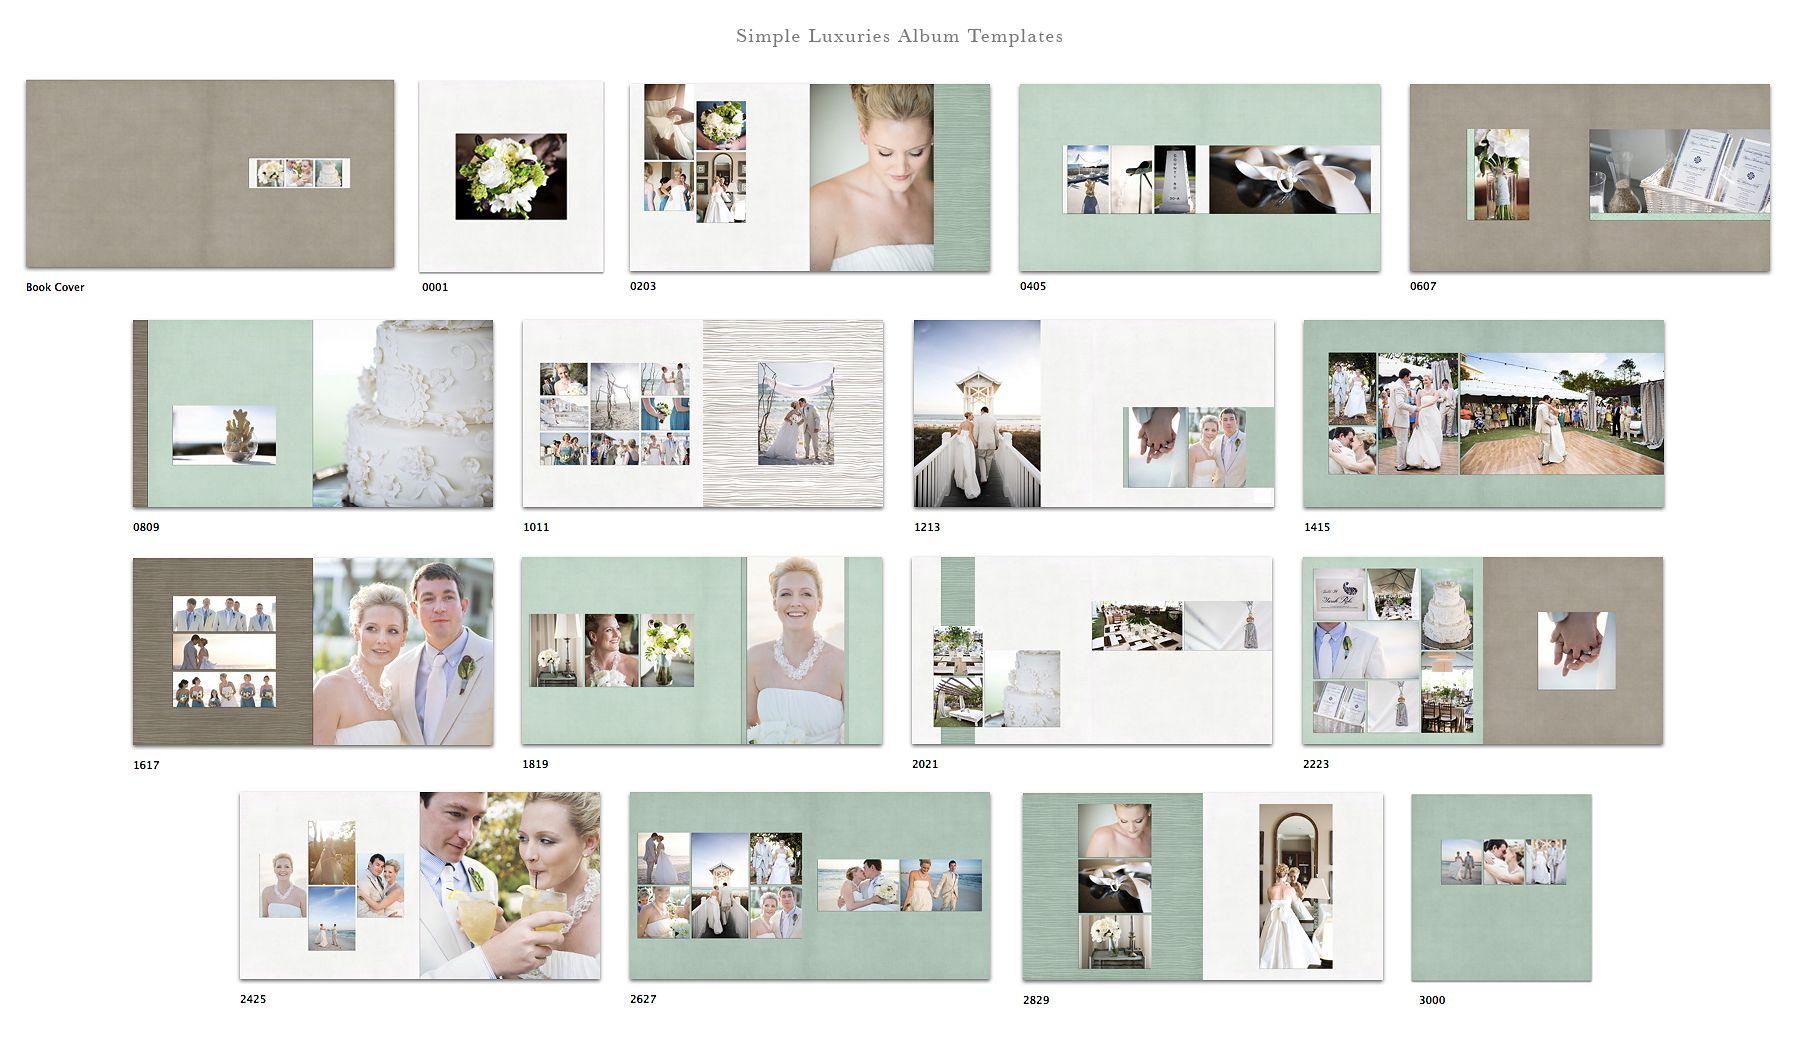 Quotes for wedding album on pinterest wedding albums for Wedding album design